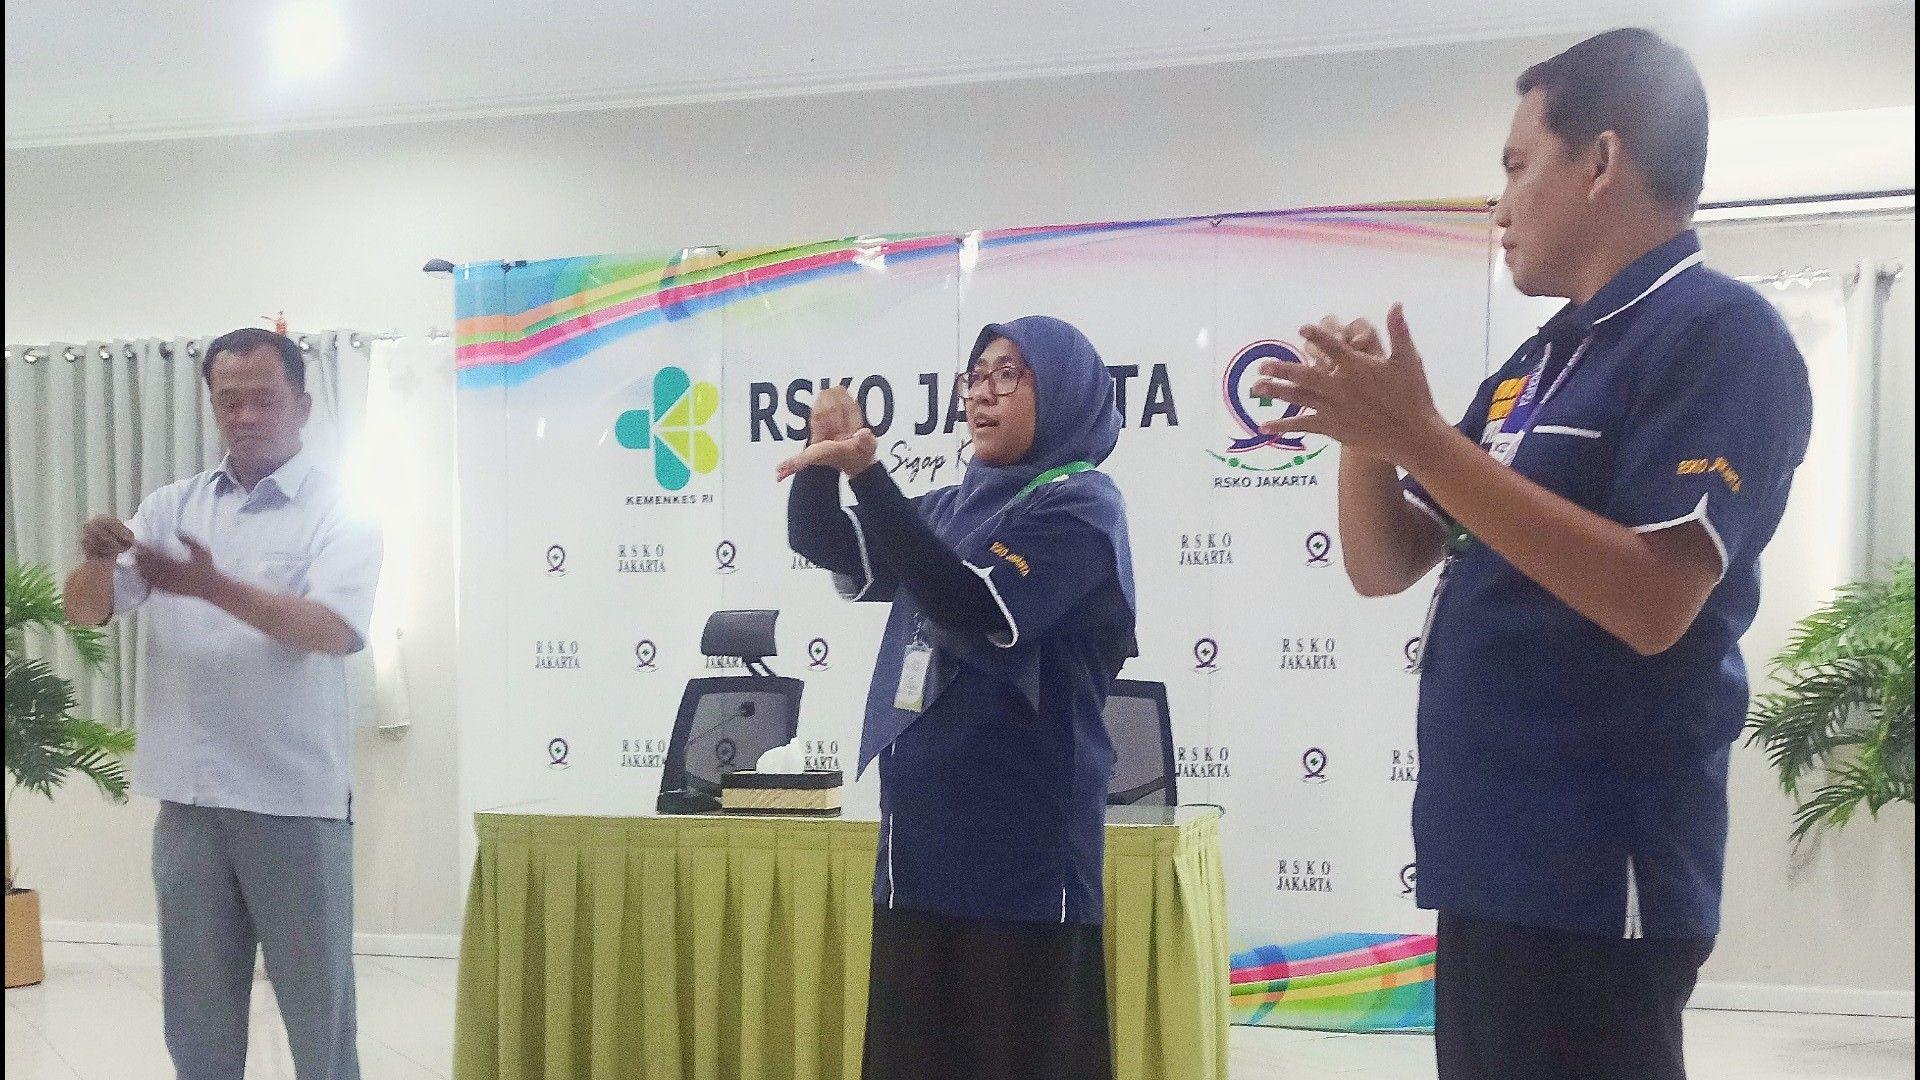 Deskripsi : Zulia Alviana, Amk, mempraktekkan hand hygiene didepan para peserta I Sumber Foto : dokpri humas RSKO